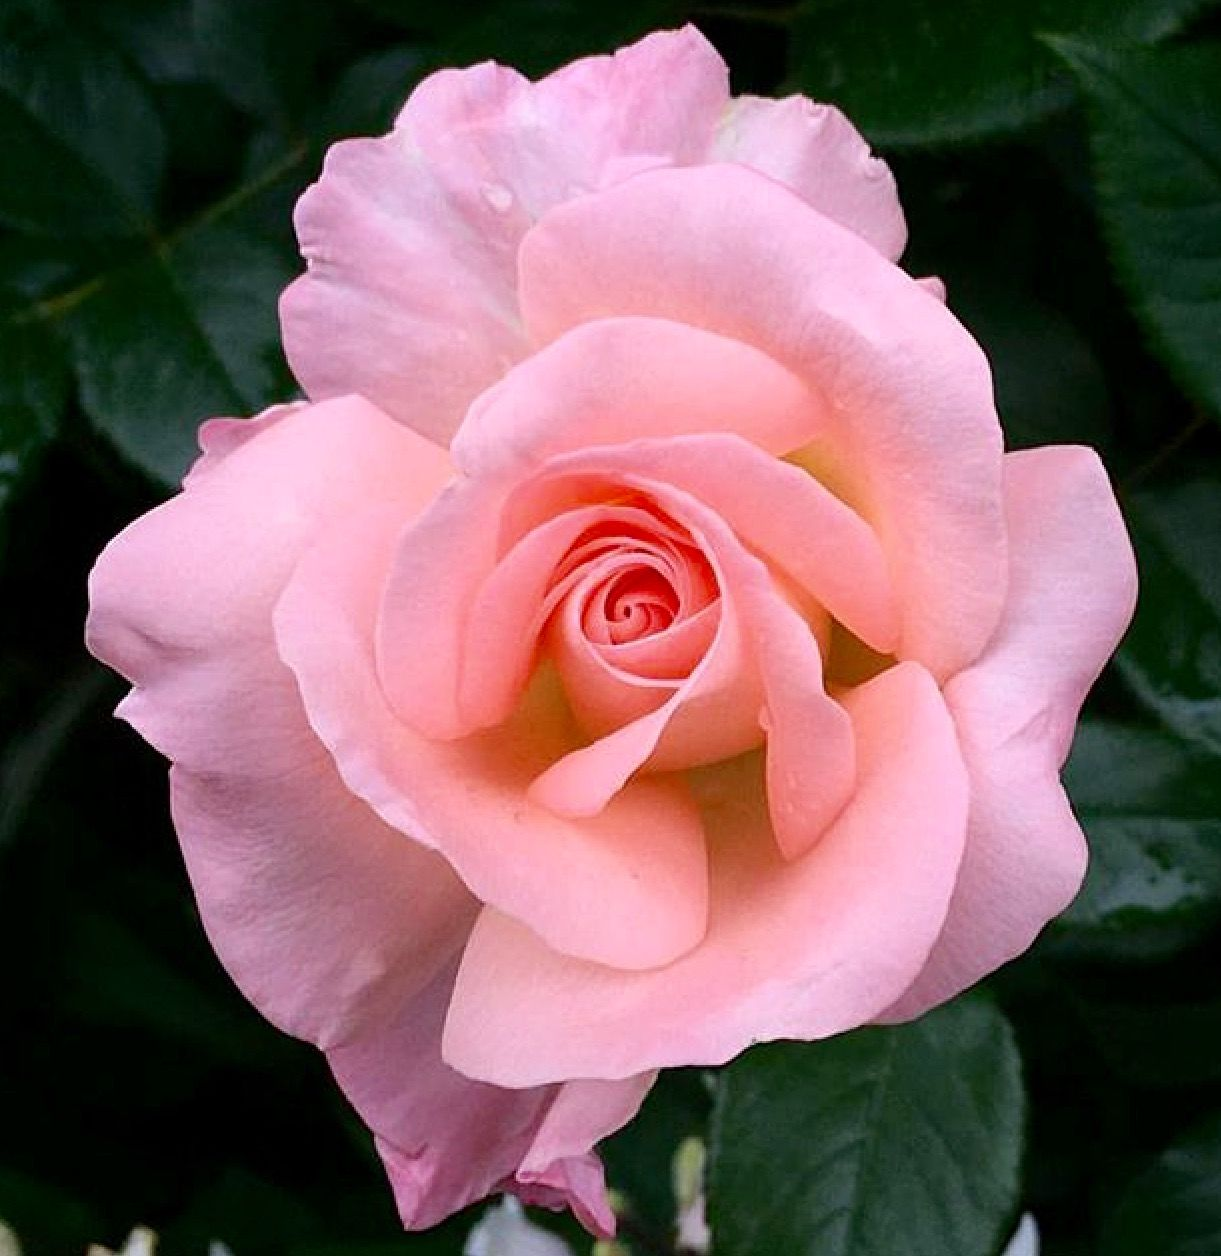 Pin By Ayegl Yney On Glistan Pinterest Flowers Beautiful